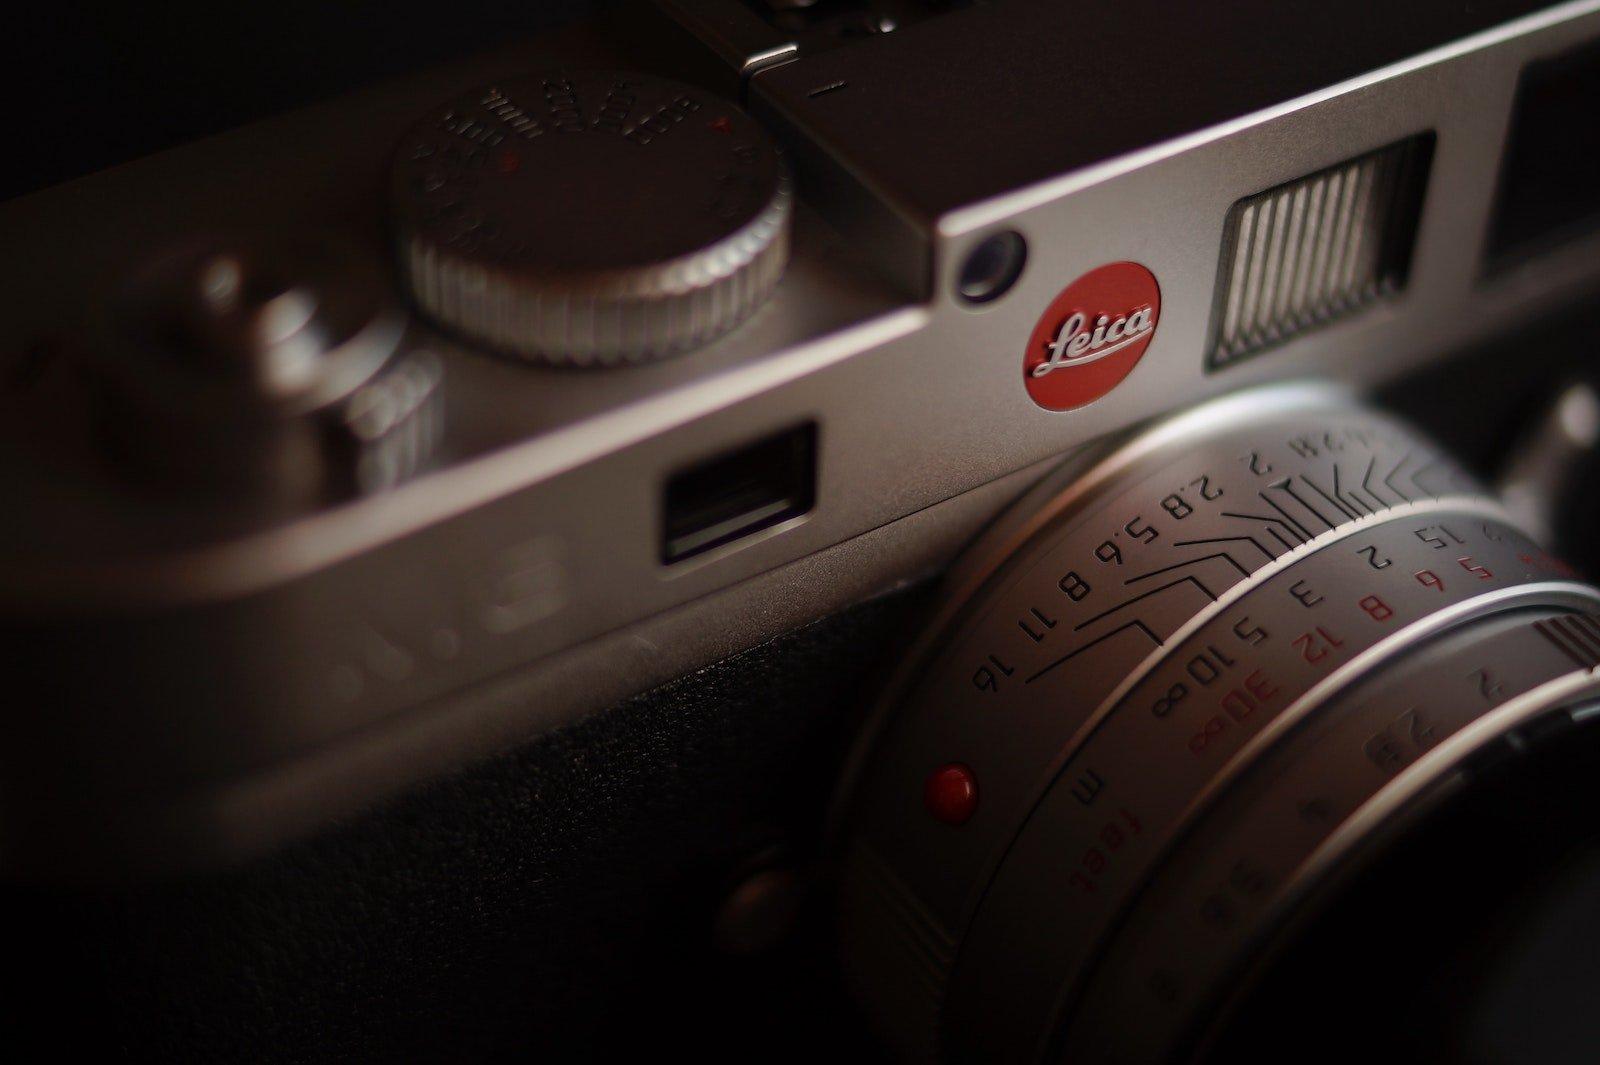 Leica Has Stopped Making the M9's CCD Sensor, Future Repairs Impossible - PetaPixel